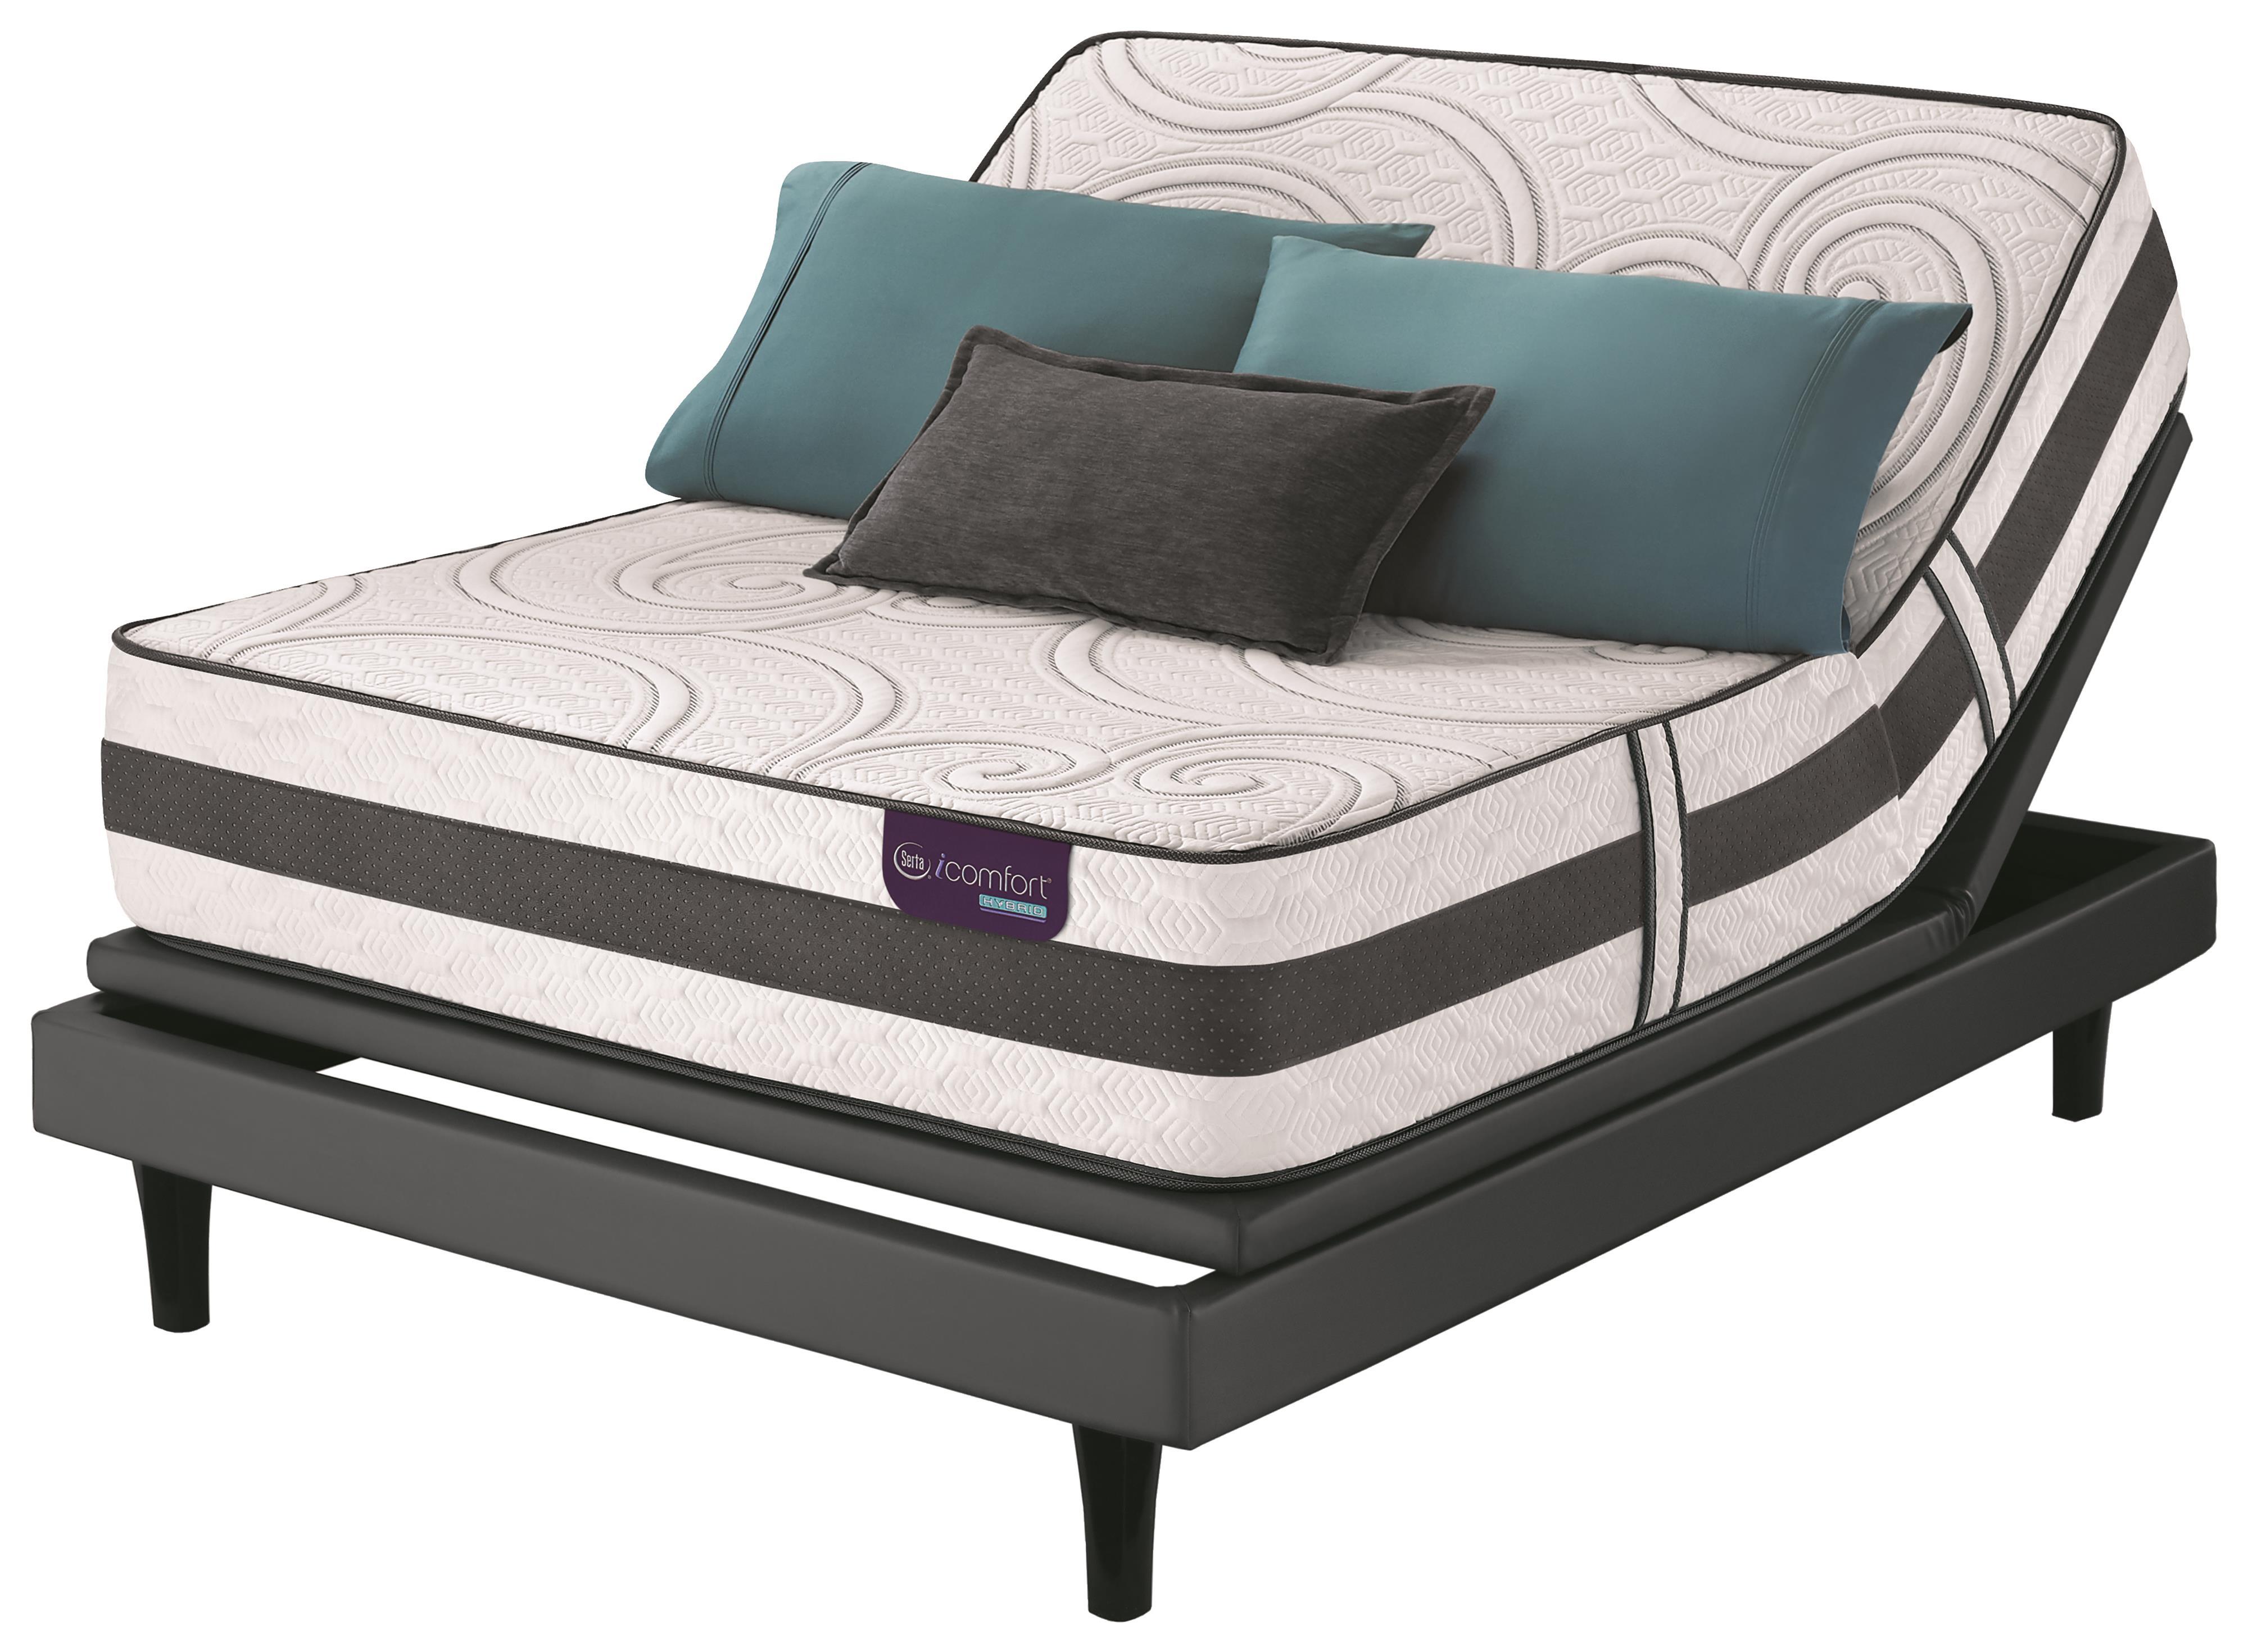 Serta iComfort Hybrid Visionaire King Extra Plush Hybrid Mattress Set, Adj - Item Number: VisionaireXP-K+MPIII-DK